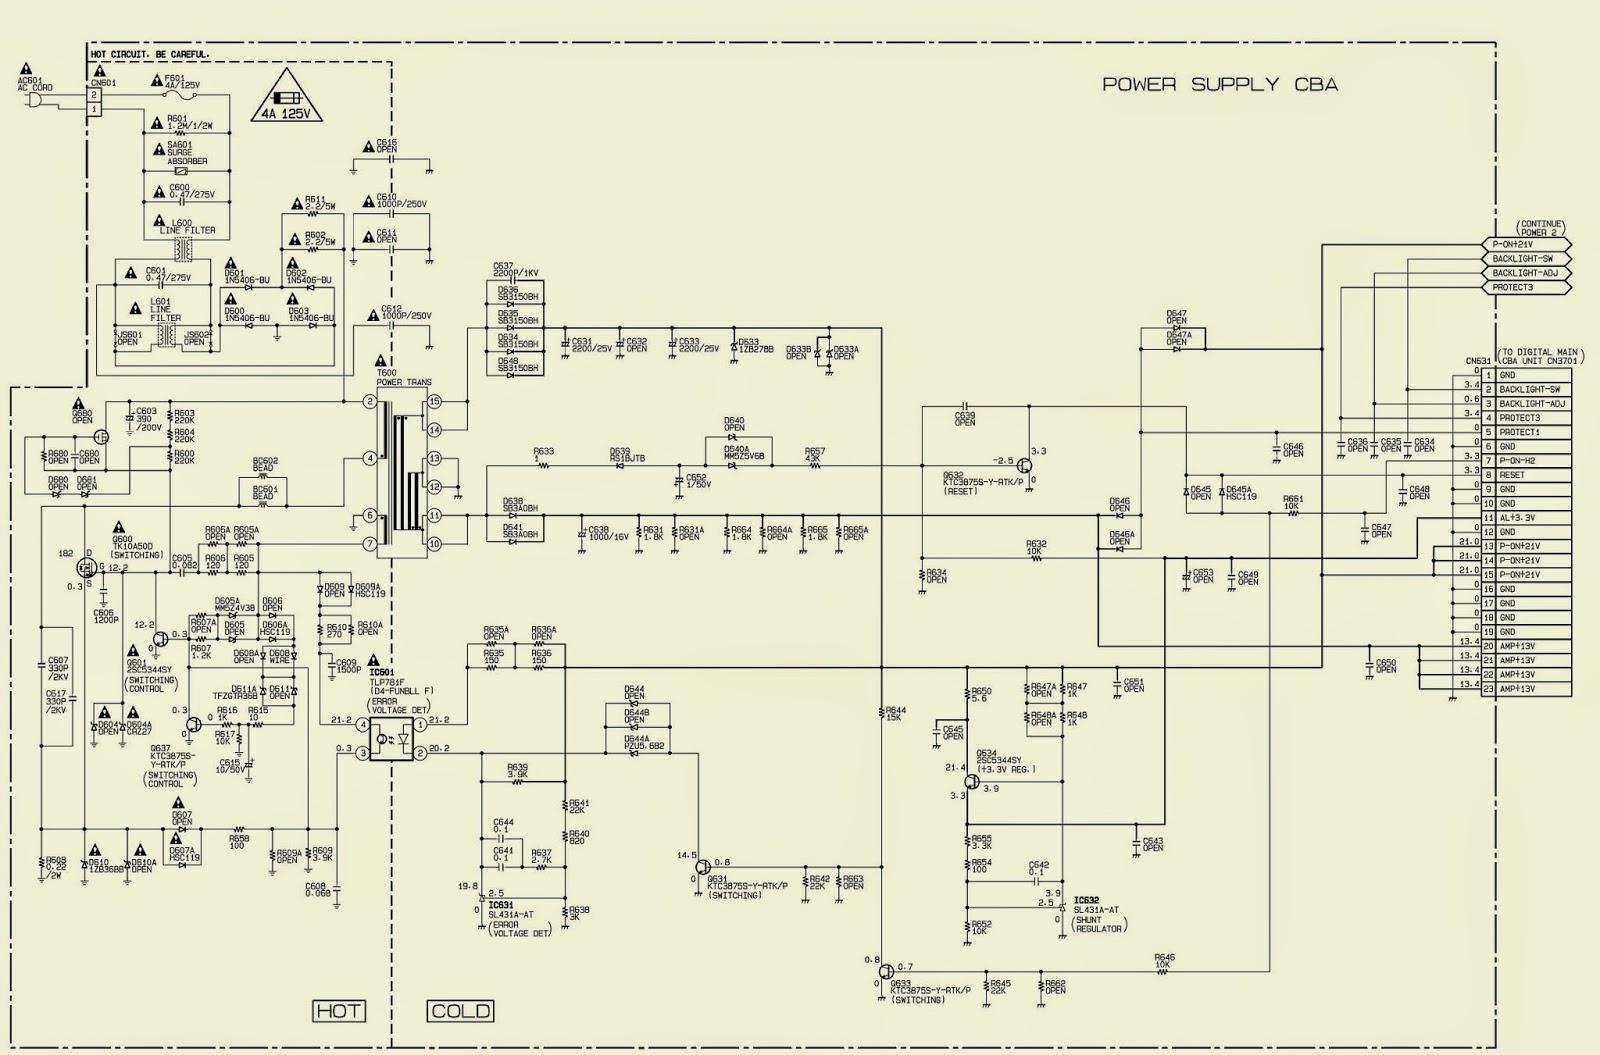 magnavox plug wiring diagram magnavox 32mf301b power supply schematic and service mode ... magnavox wiring diagram